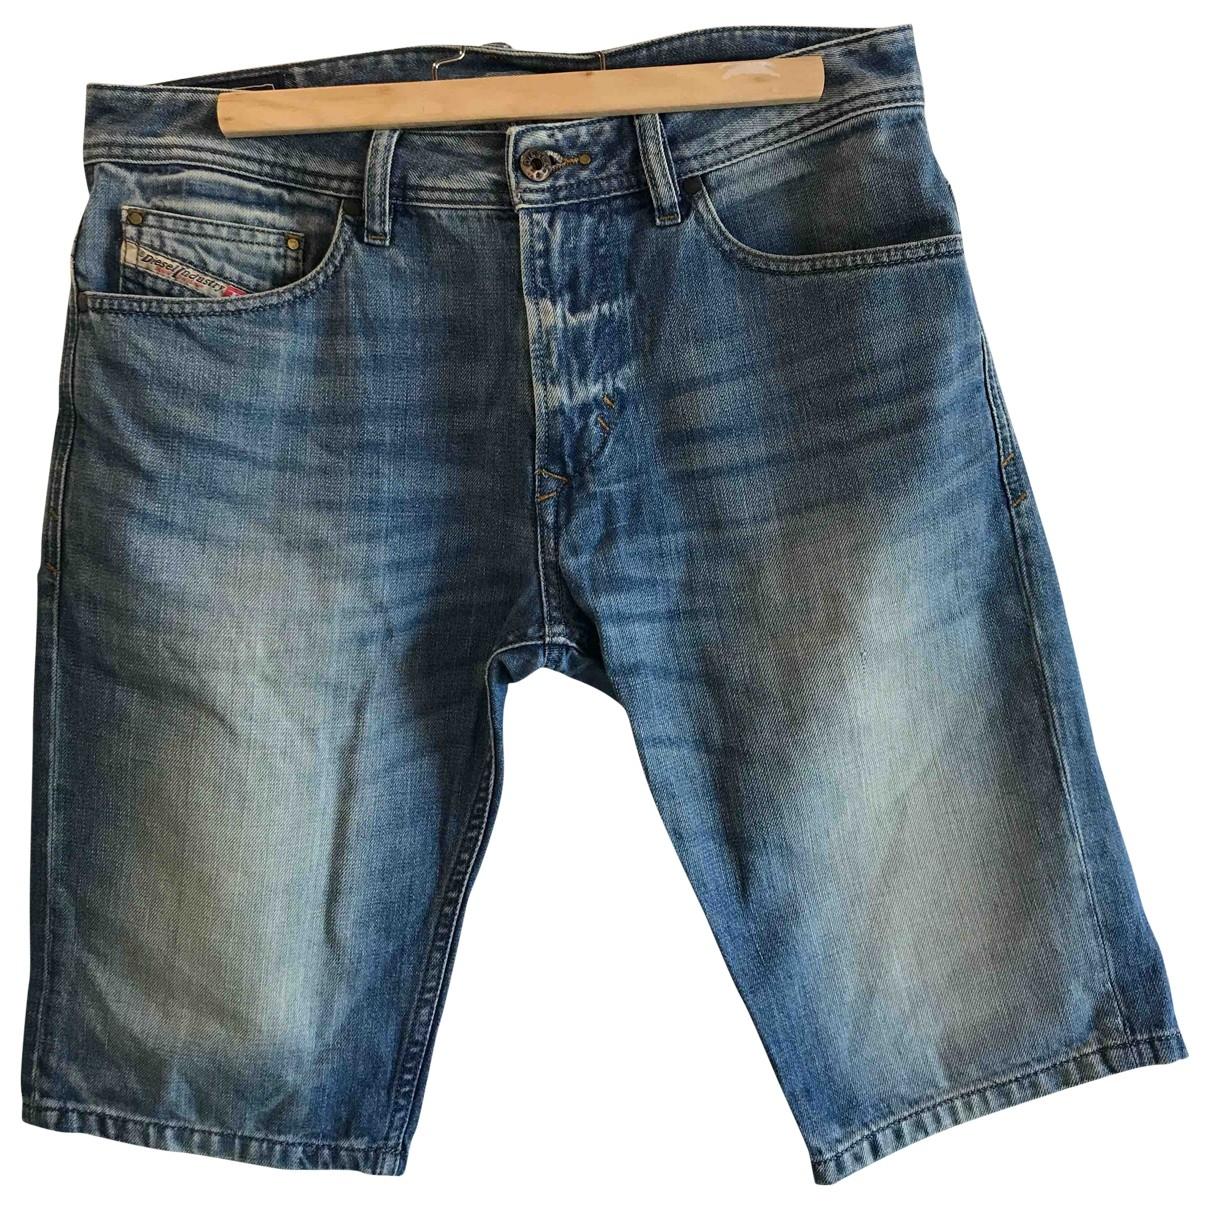 Diesel \N Blue Denim - Jeans Shorts for Men 30 UK - US